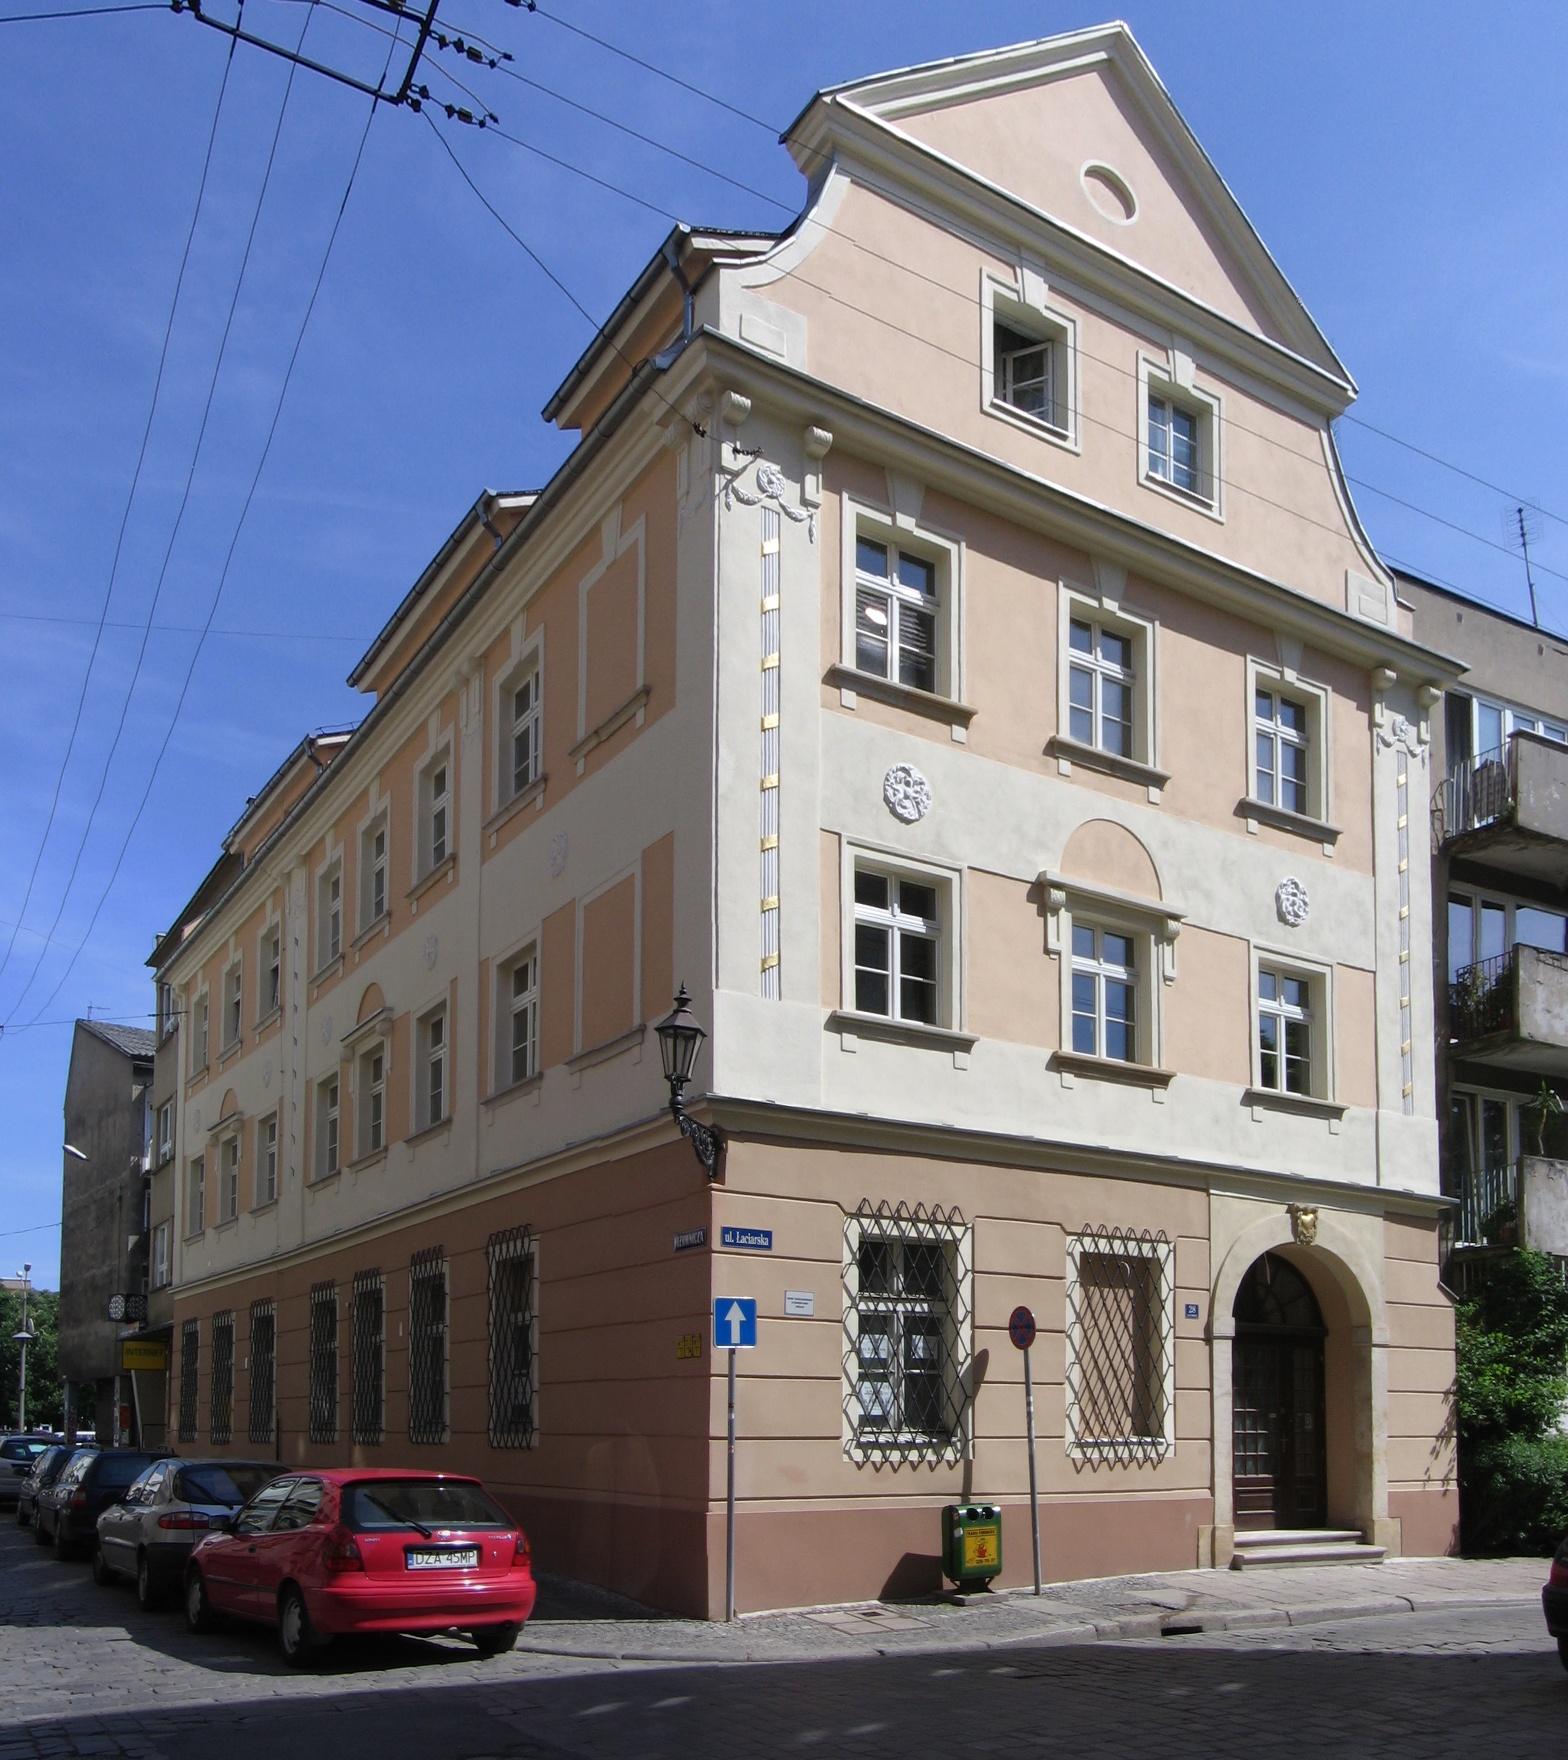 Ulica Łaciarska we Wrocławiu